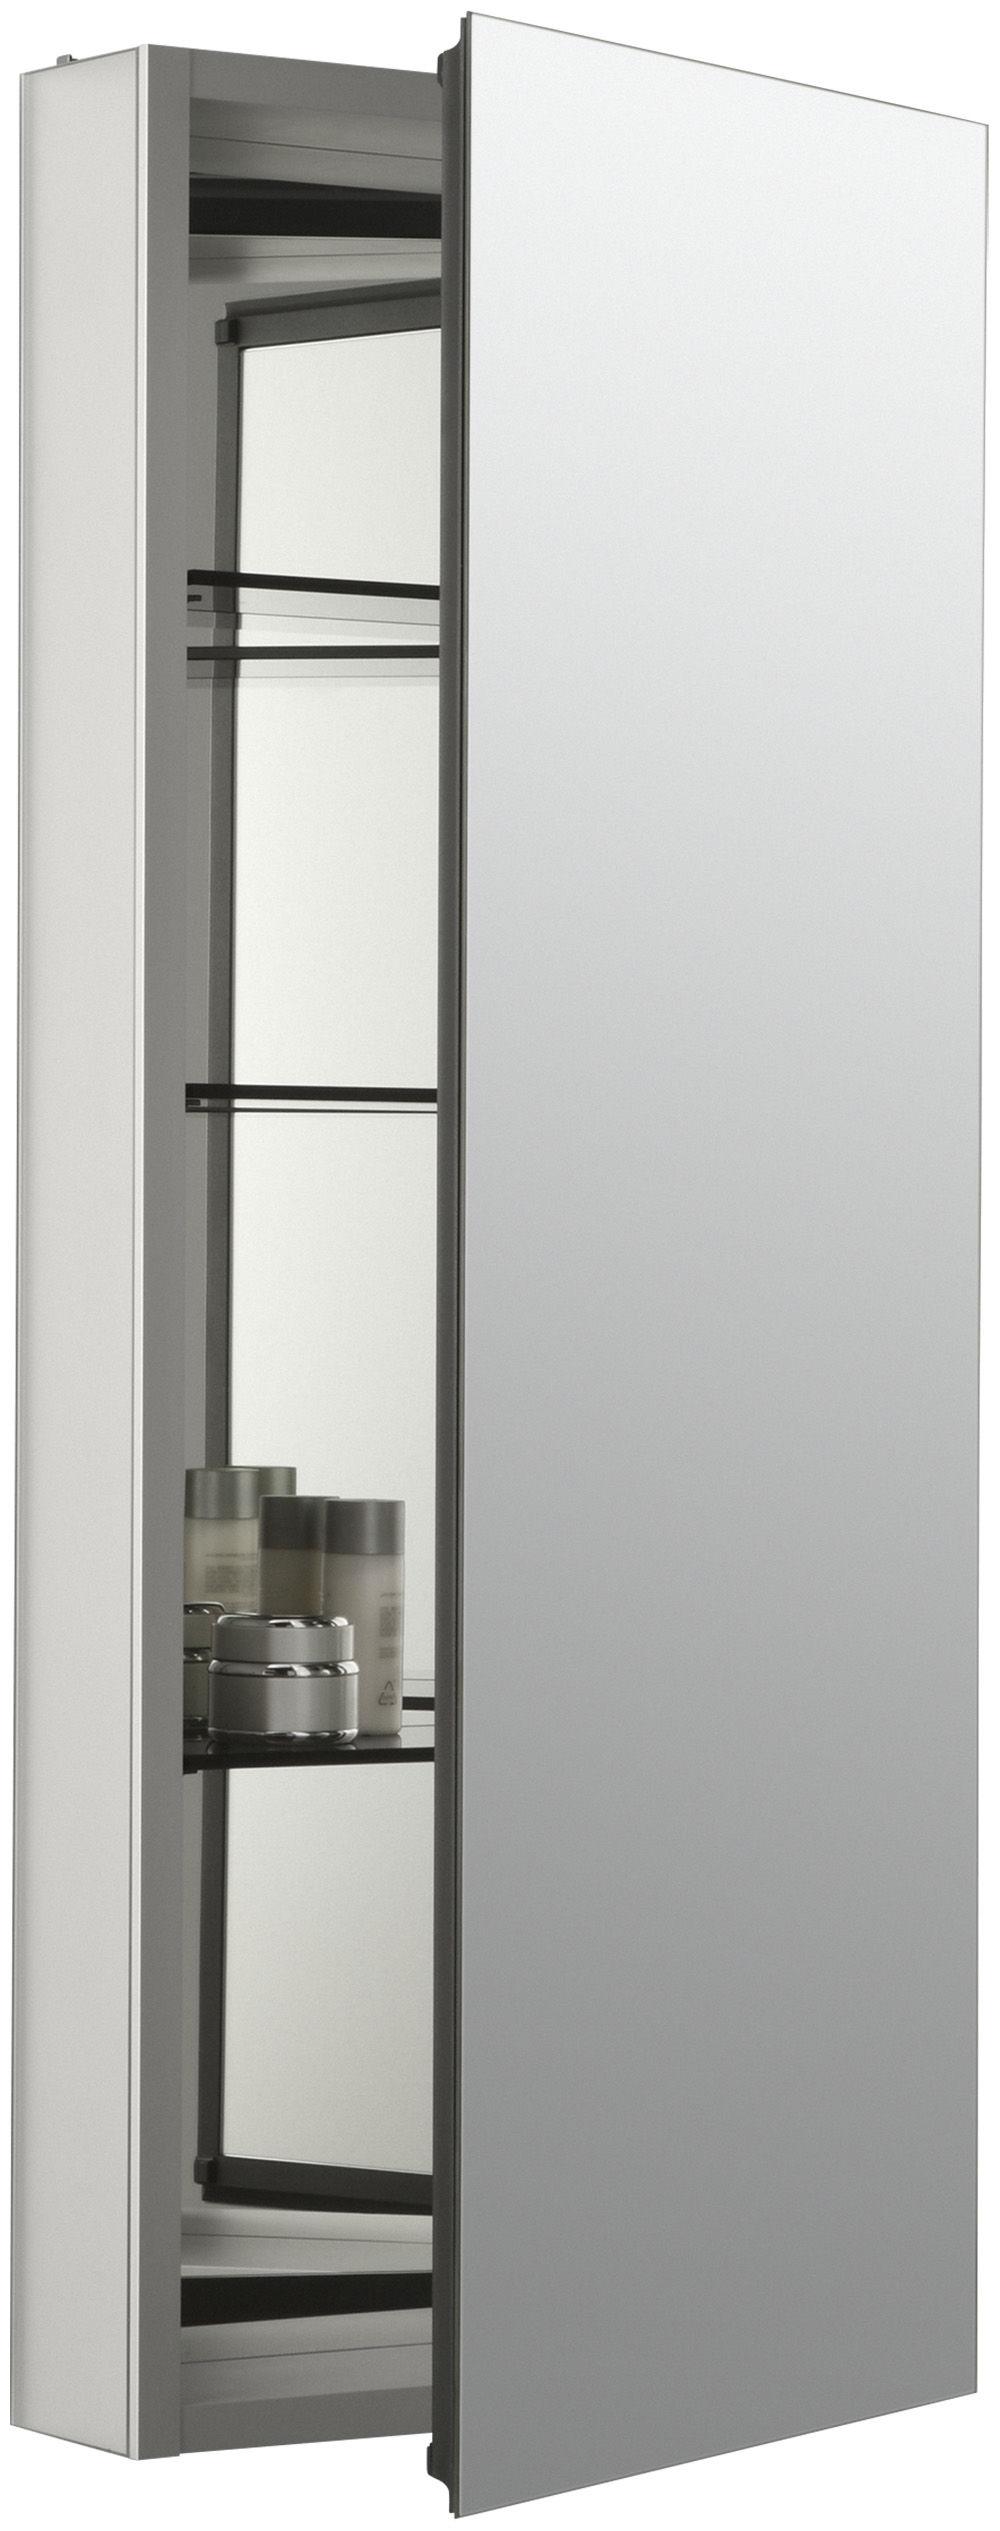 Kohler K-2913-PG-SAA Satin Anodized Aluminum Catalan 15\